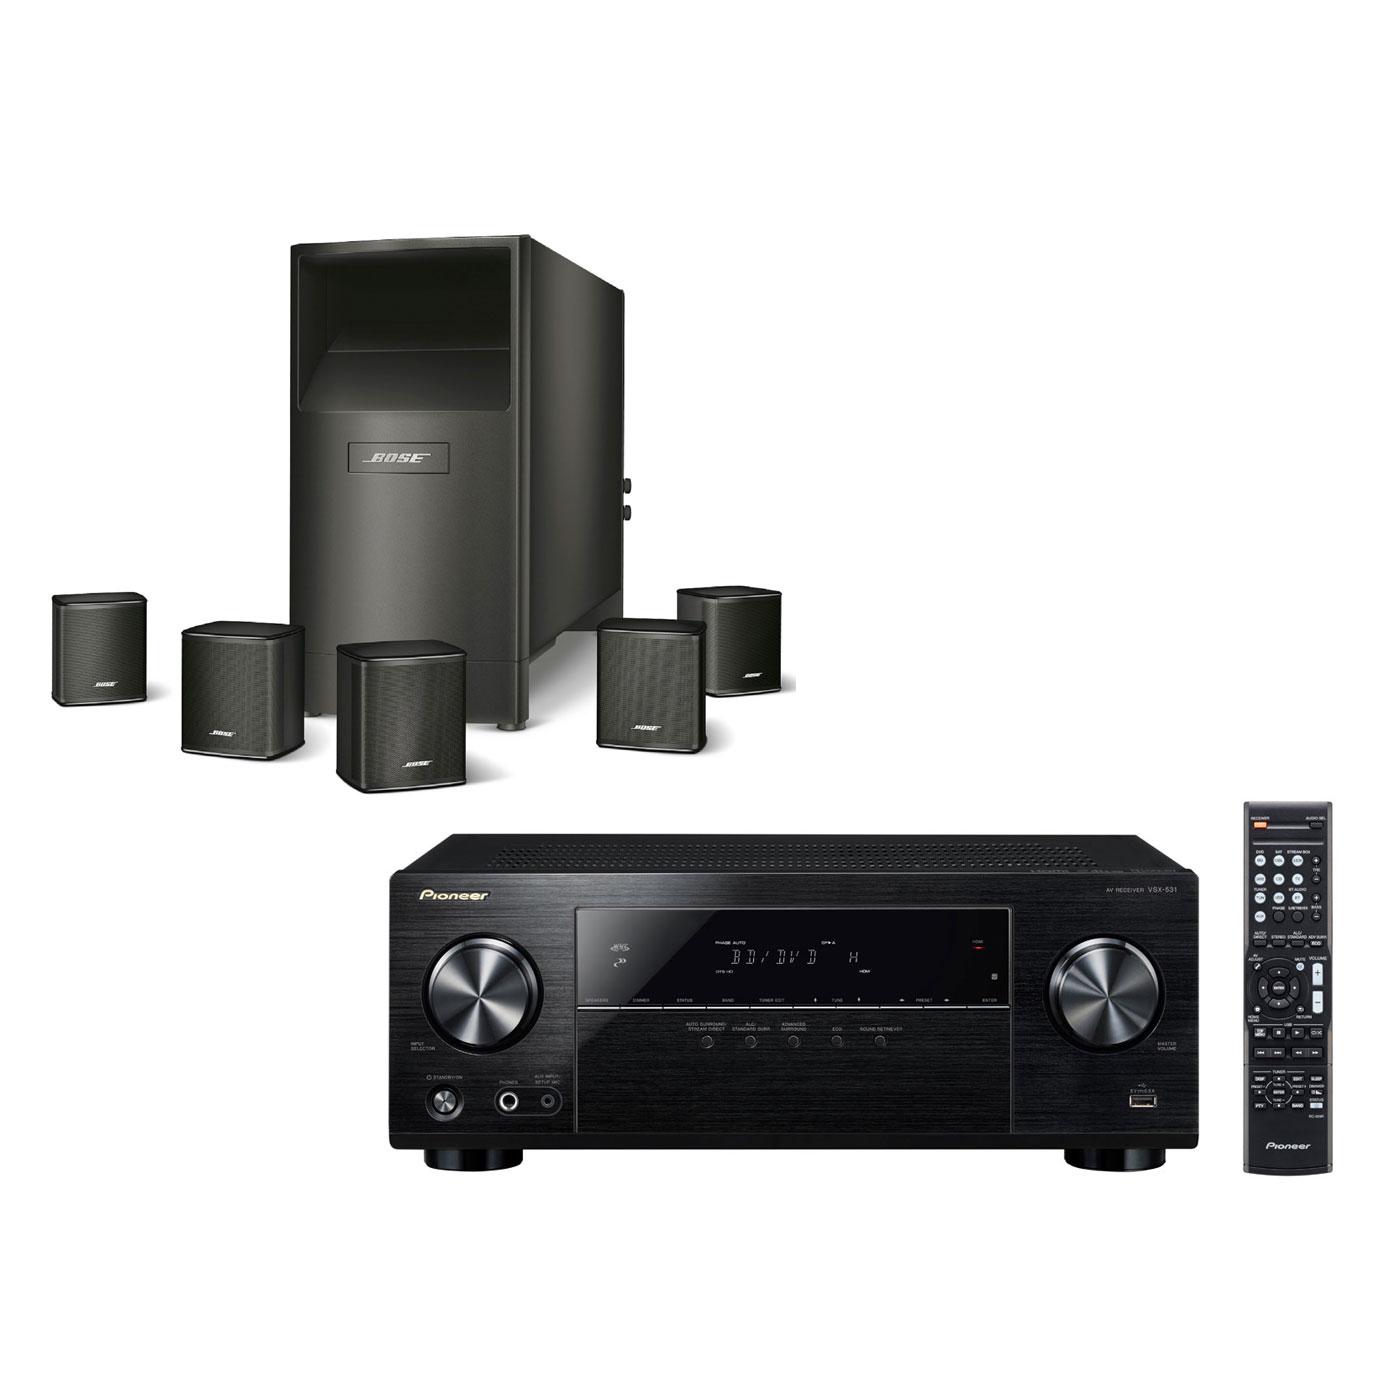 Pioneer Vsx 531b Bose Acoustimass 6 S Ries V Noir Ensemble  # Meuble Tv Home Cinema Integre Bose